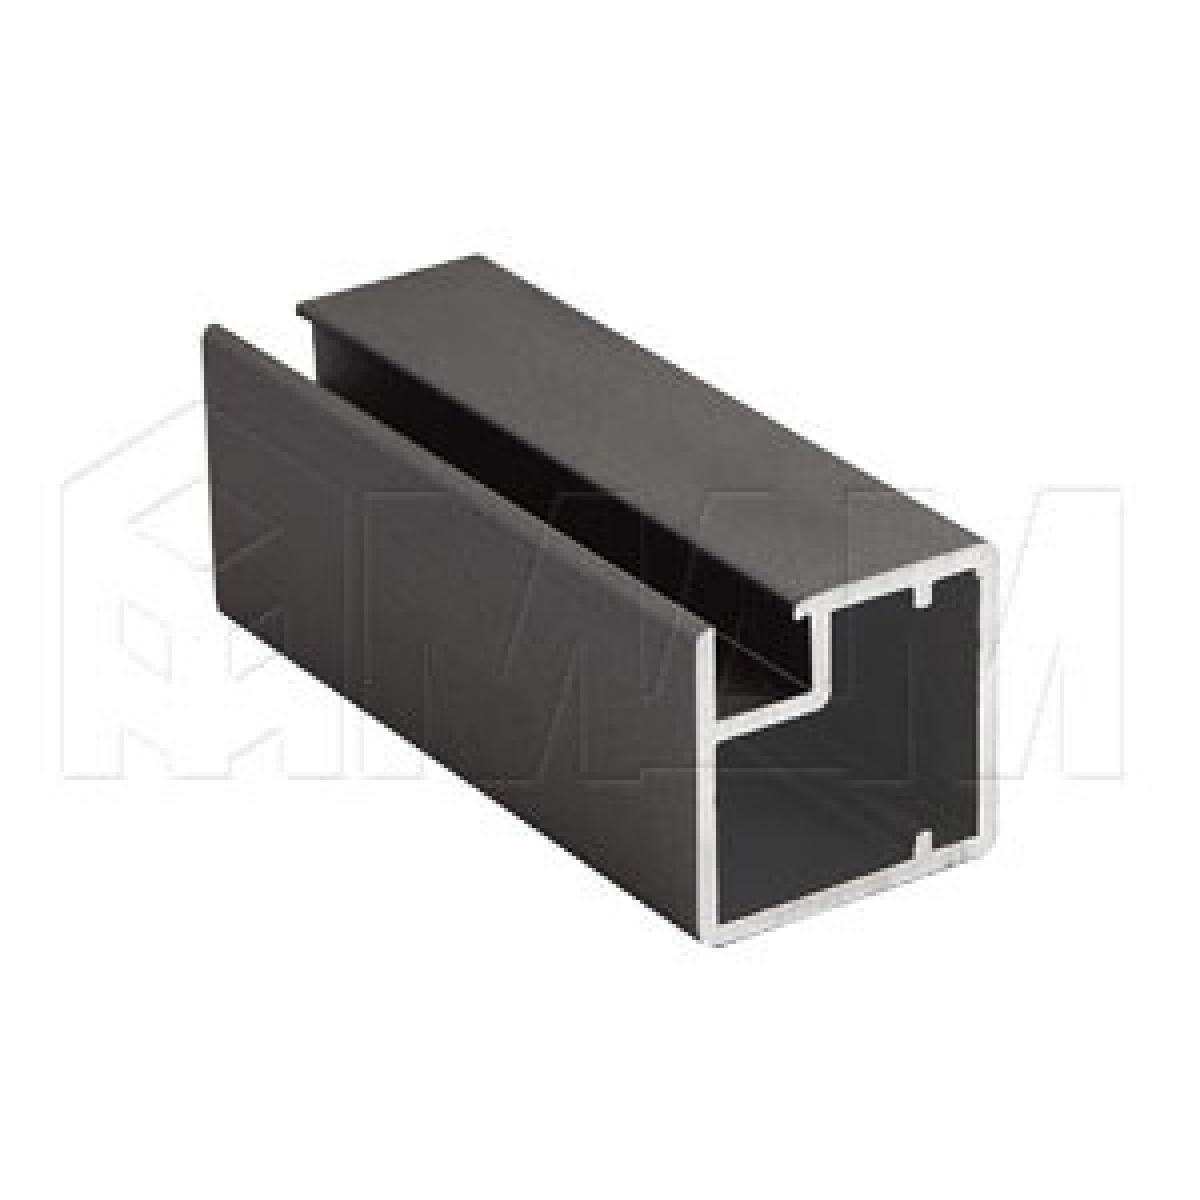 INTEGRO Профиль рамочный узкий, 19х20х19, бронза, L-6000